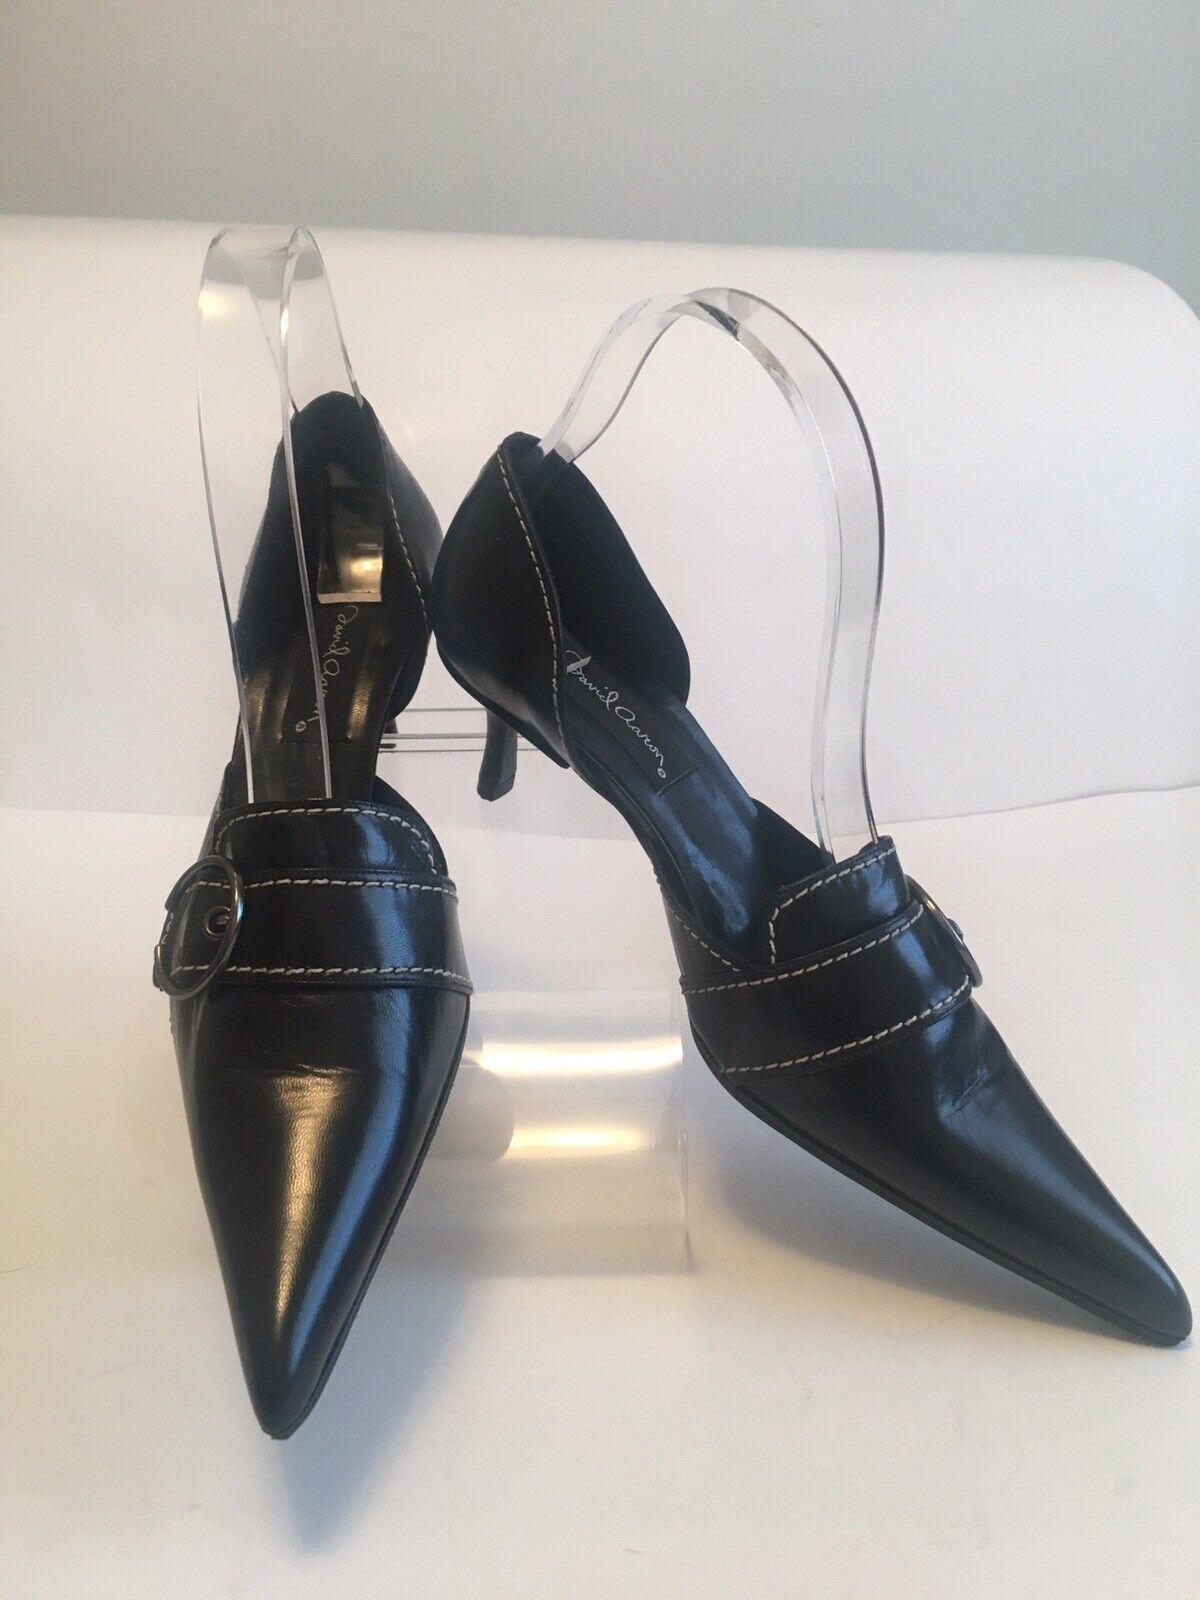 sconto di vendita David Aaron nero Leather Kitten Heel scarpe US Sz 8M 8M 8M  salutare